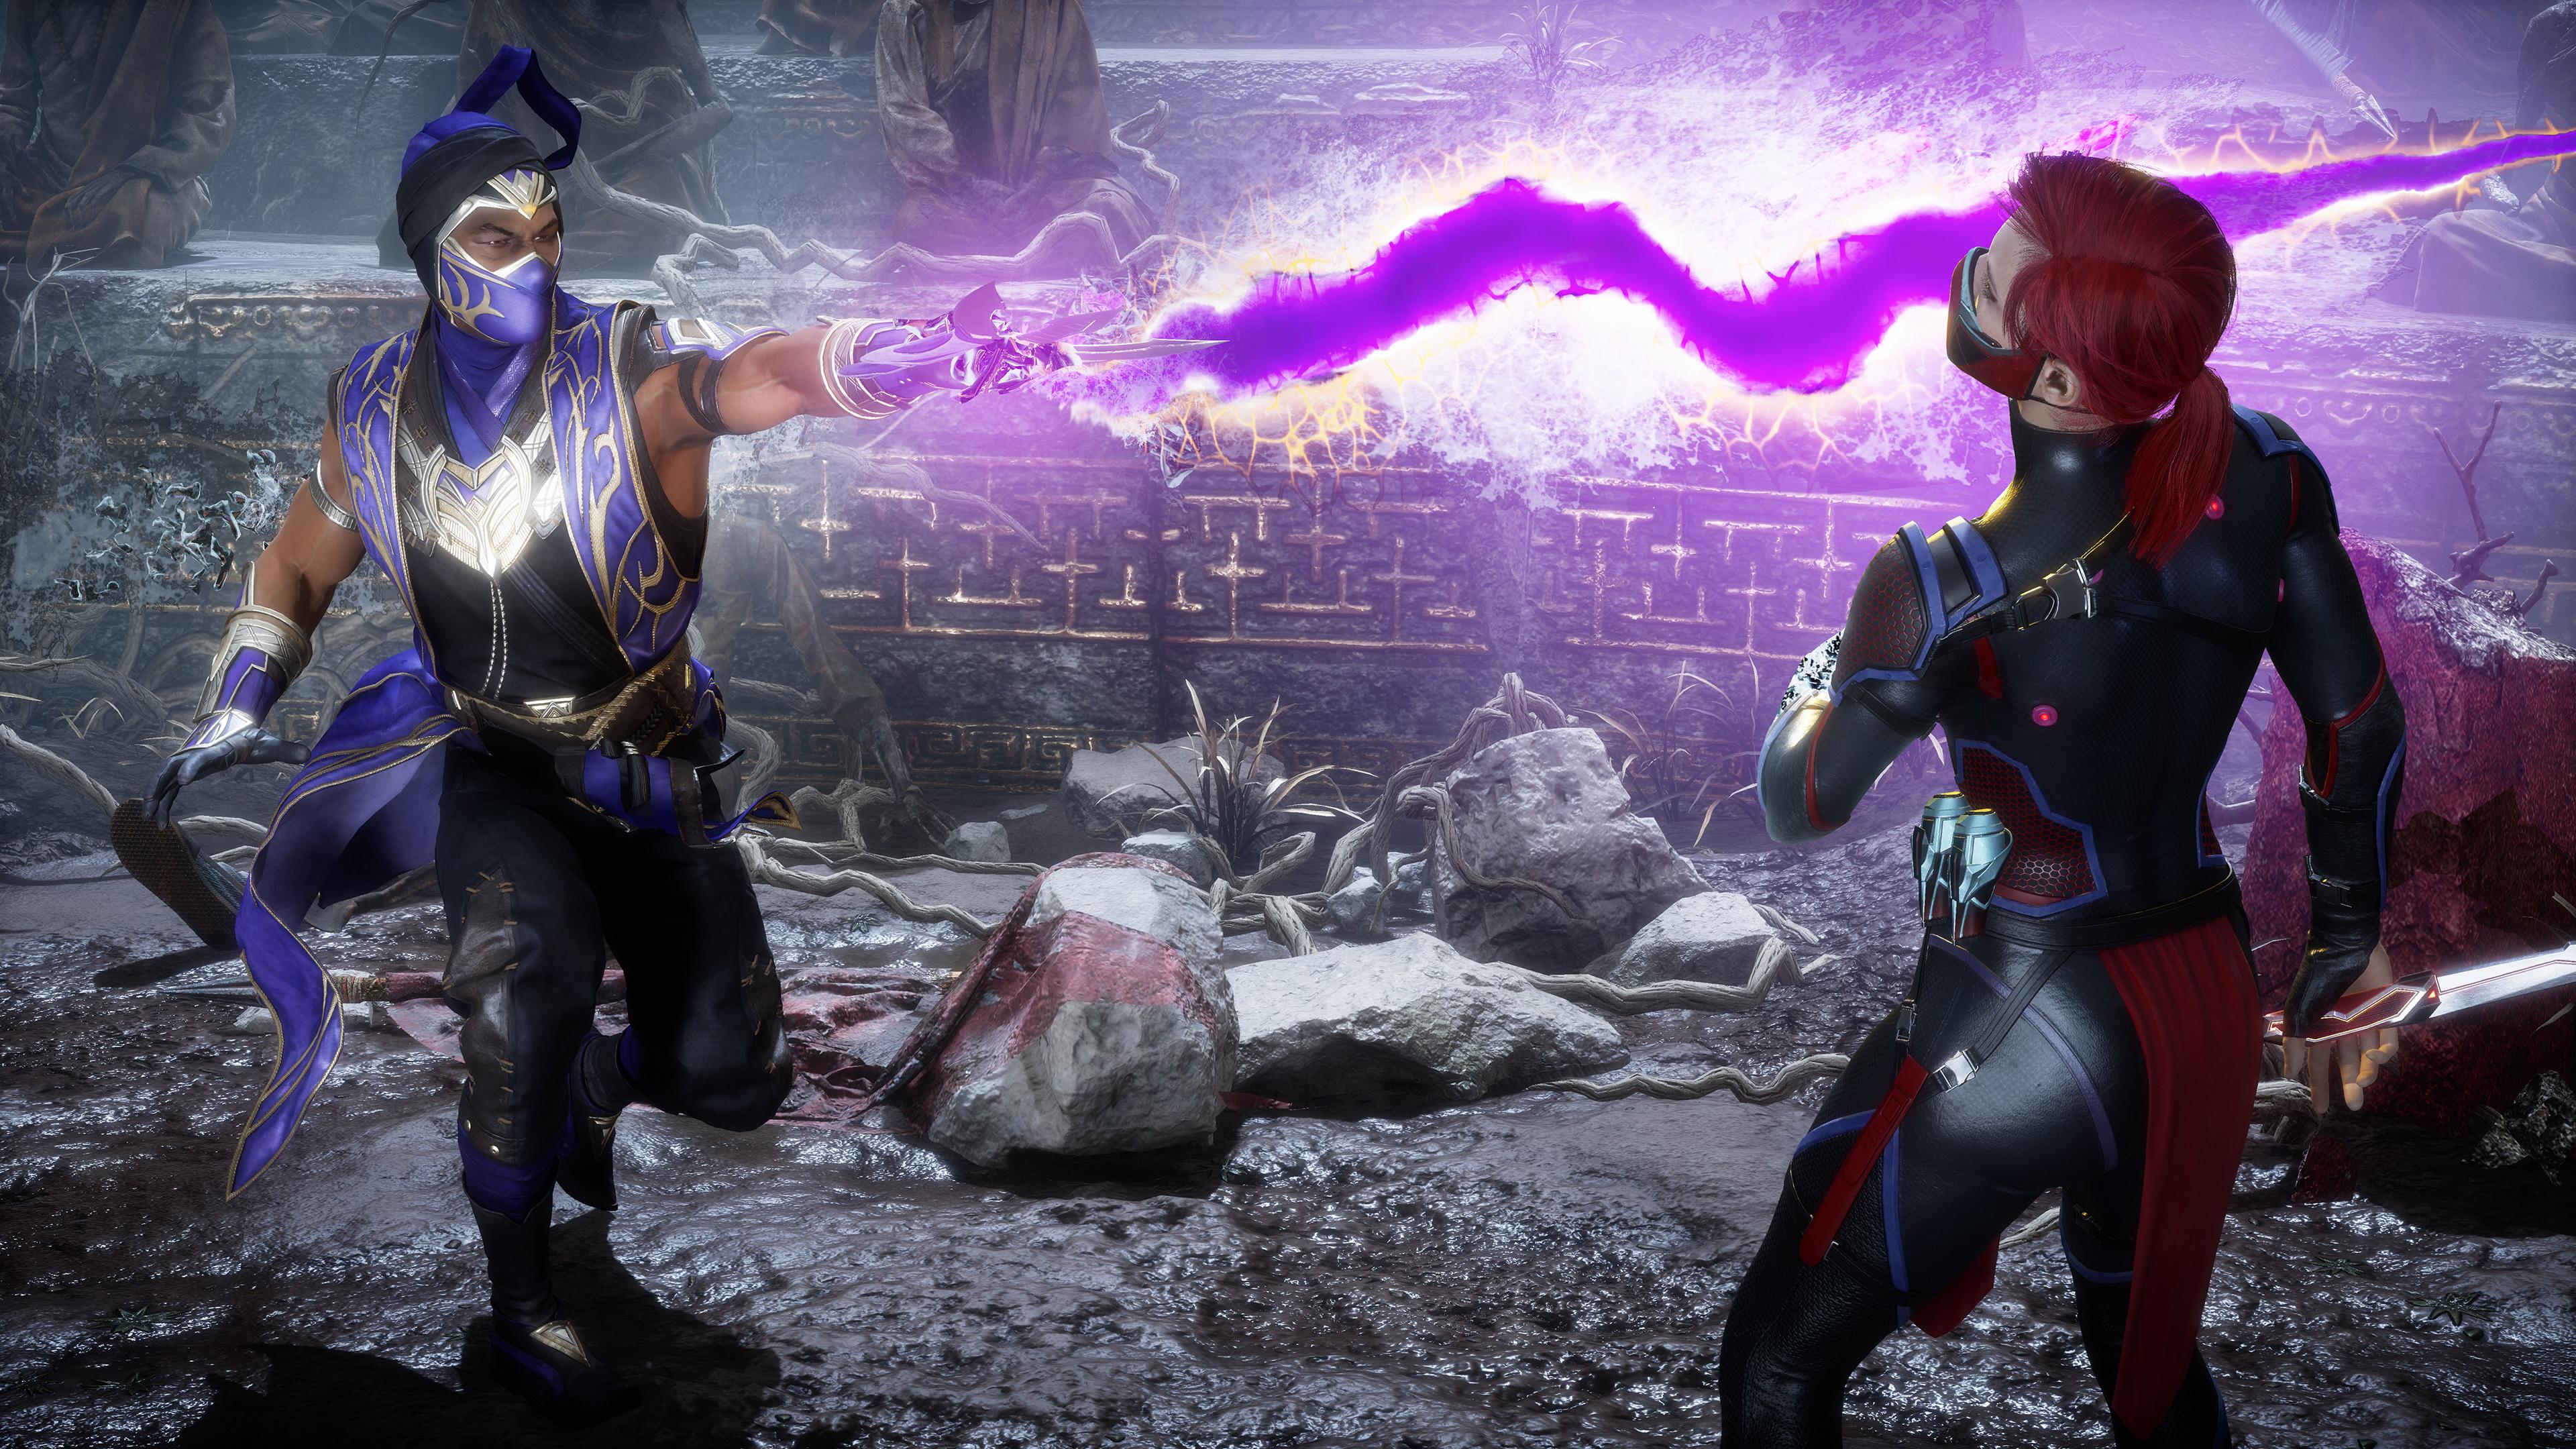 Скриншот №3 к Ultimate-издание Mortal Kombat11 PS4 and PS5